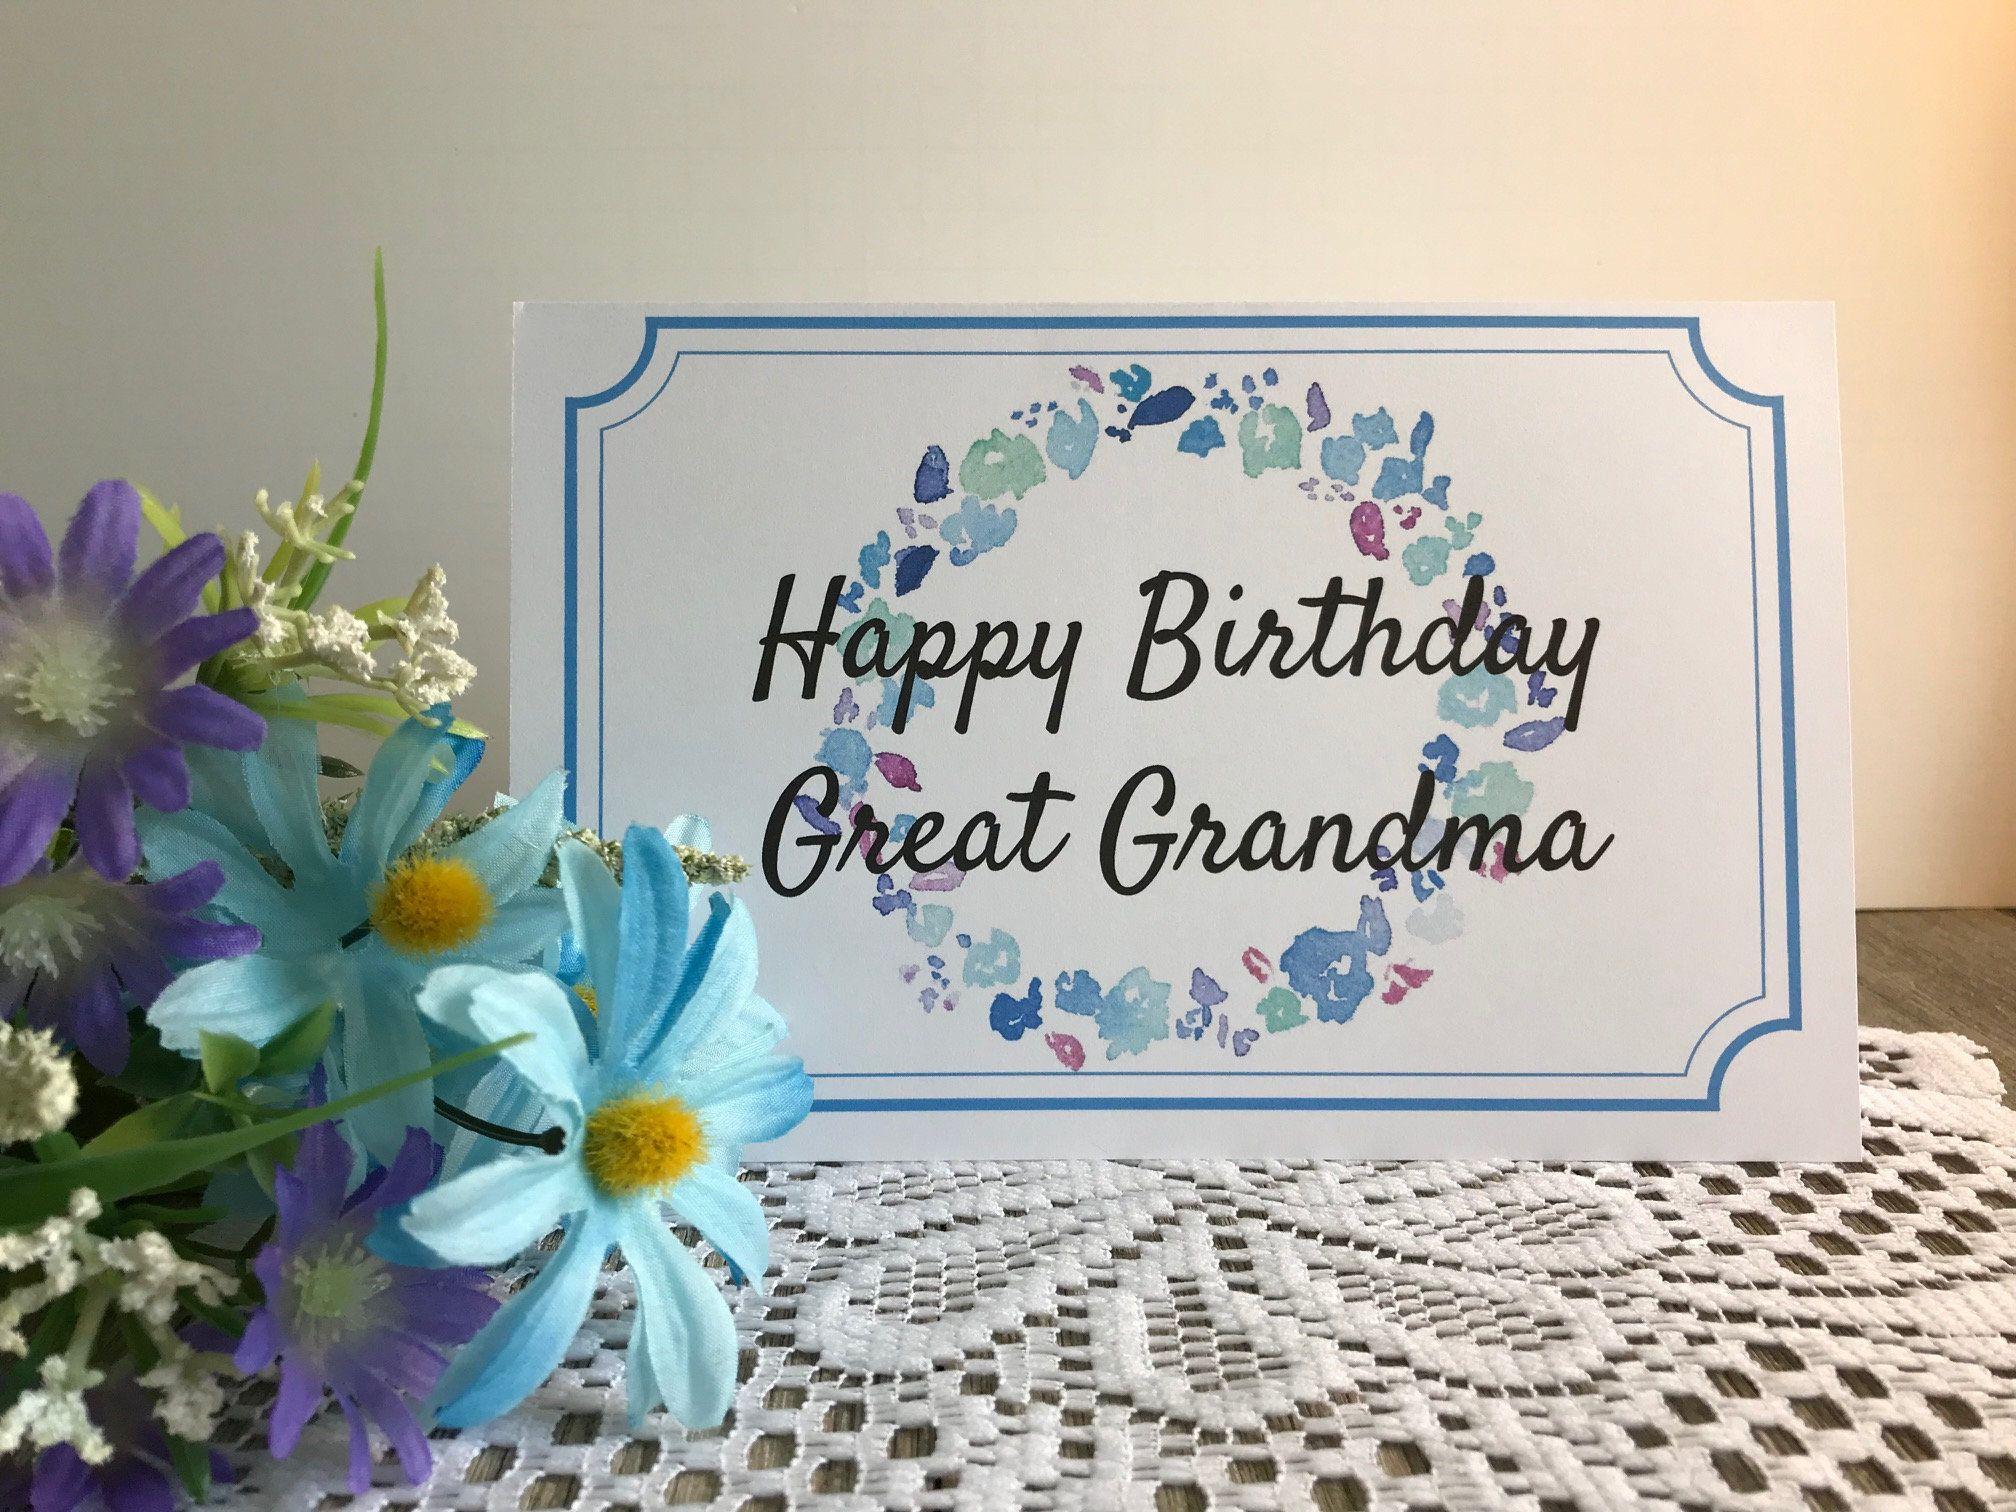 Printable Birthday Card For Great Grandma Greeting Card For Great Grandmother Grandma Mom Mom Grammy Granny Birthday Card Printable Birthday Poster Diy Happy Birthday Grandma